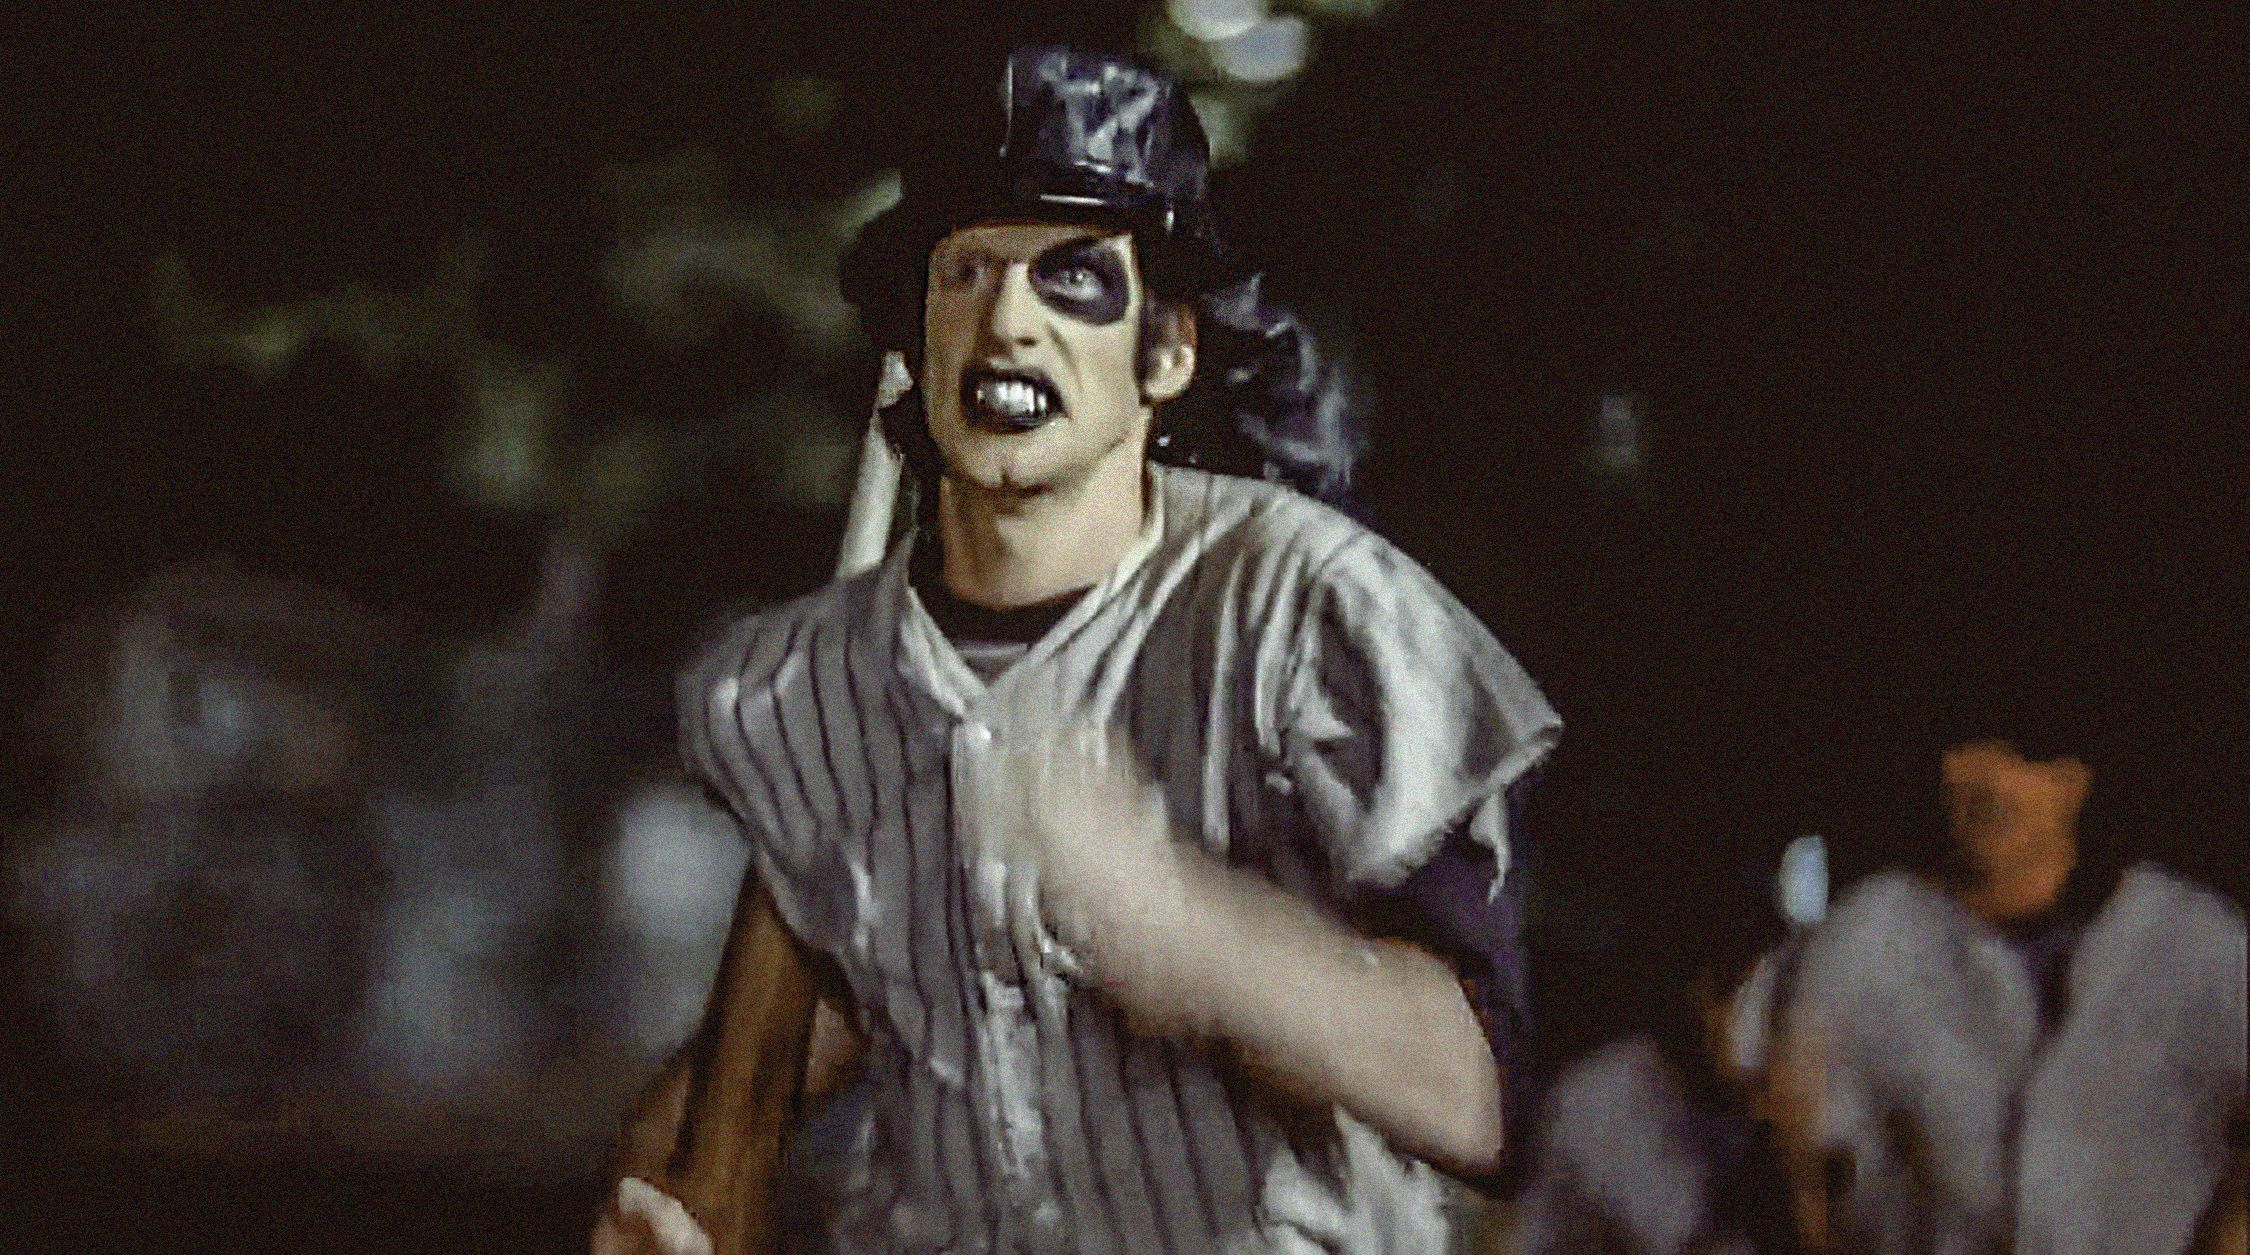 The Warriors Gang Movie 1979 Baseball Furies Warrior Movie The Warriors Baseball Furies Warrior